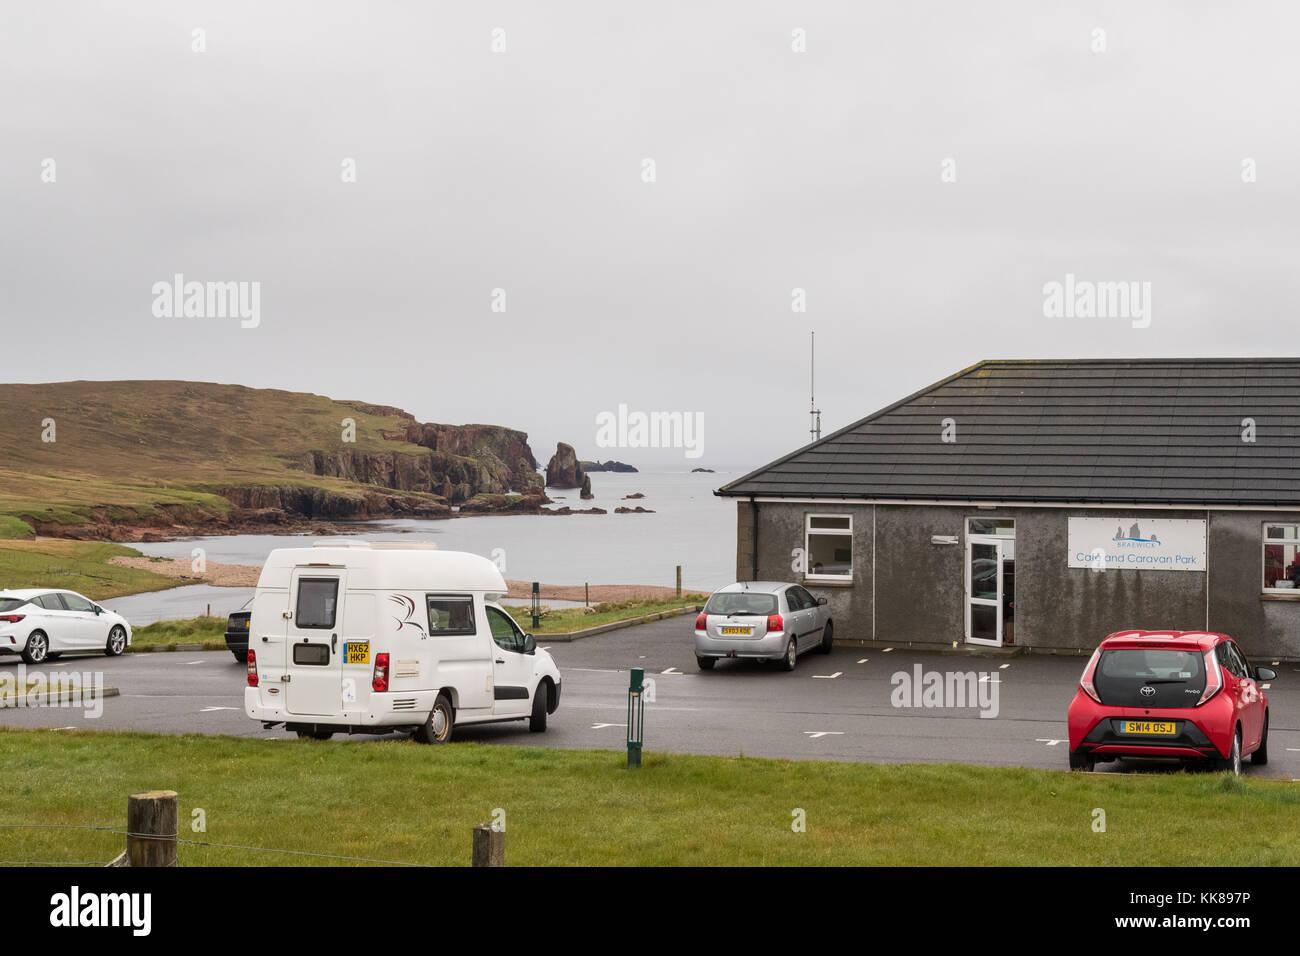 Braewick cafe campsite, Eshaness, Shetland Islands, Scotland uK - Stock Image